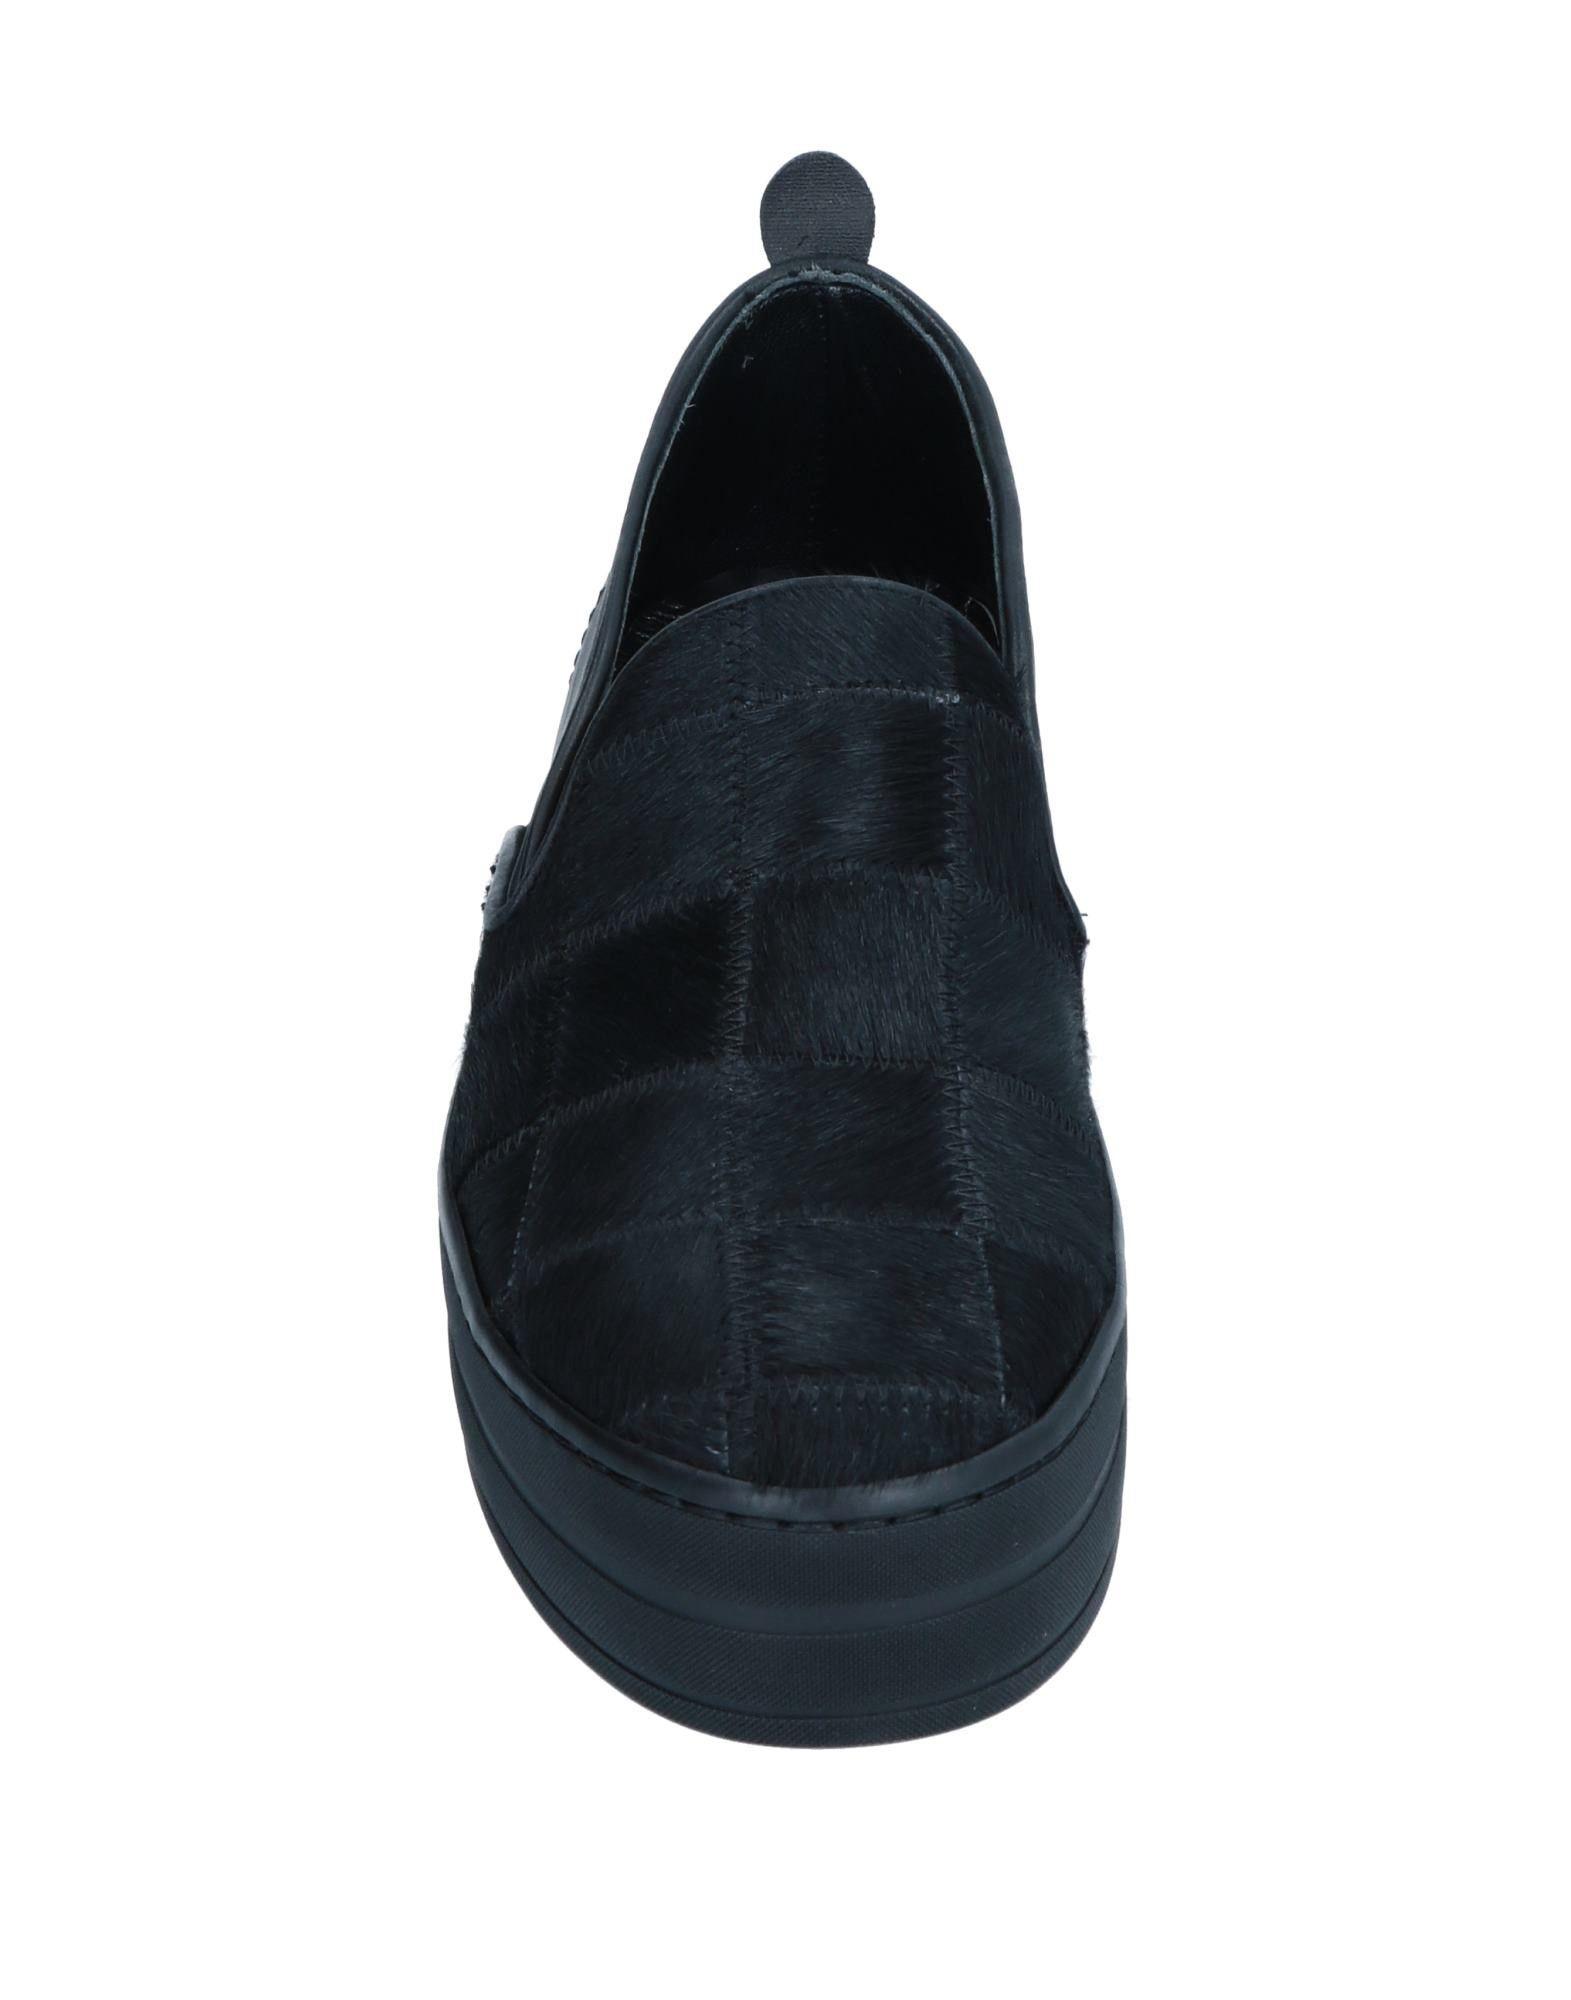 San Crispino Sneakers Damen  Schuhe 11546096SF Gute Qualität beliebte Schuhe  a14f1e